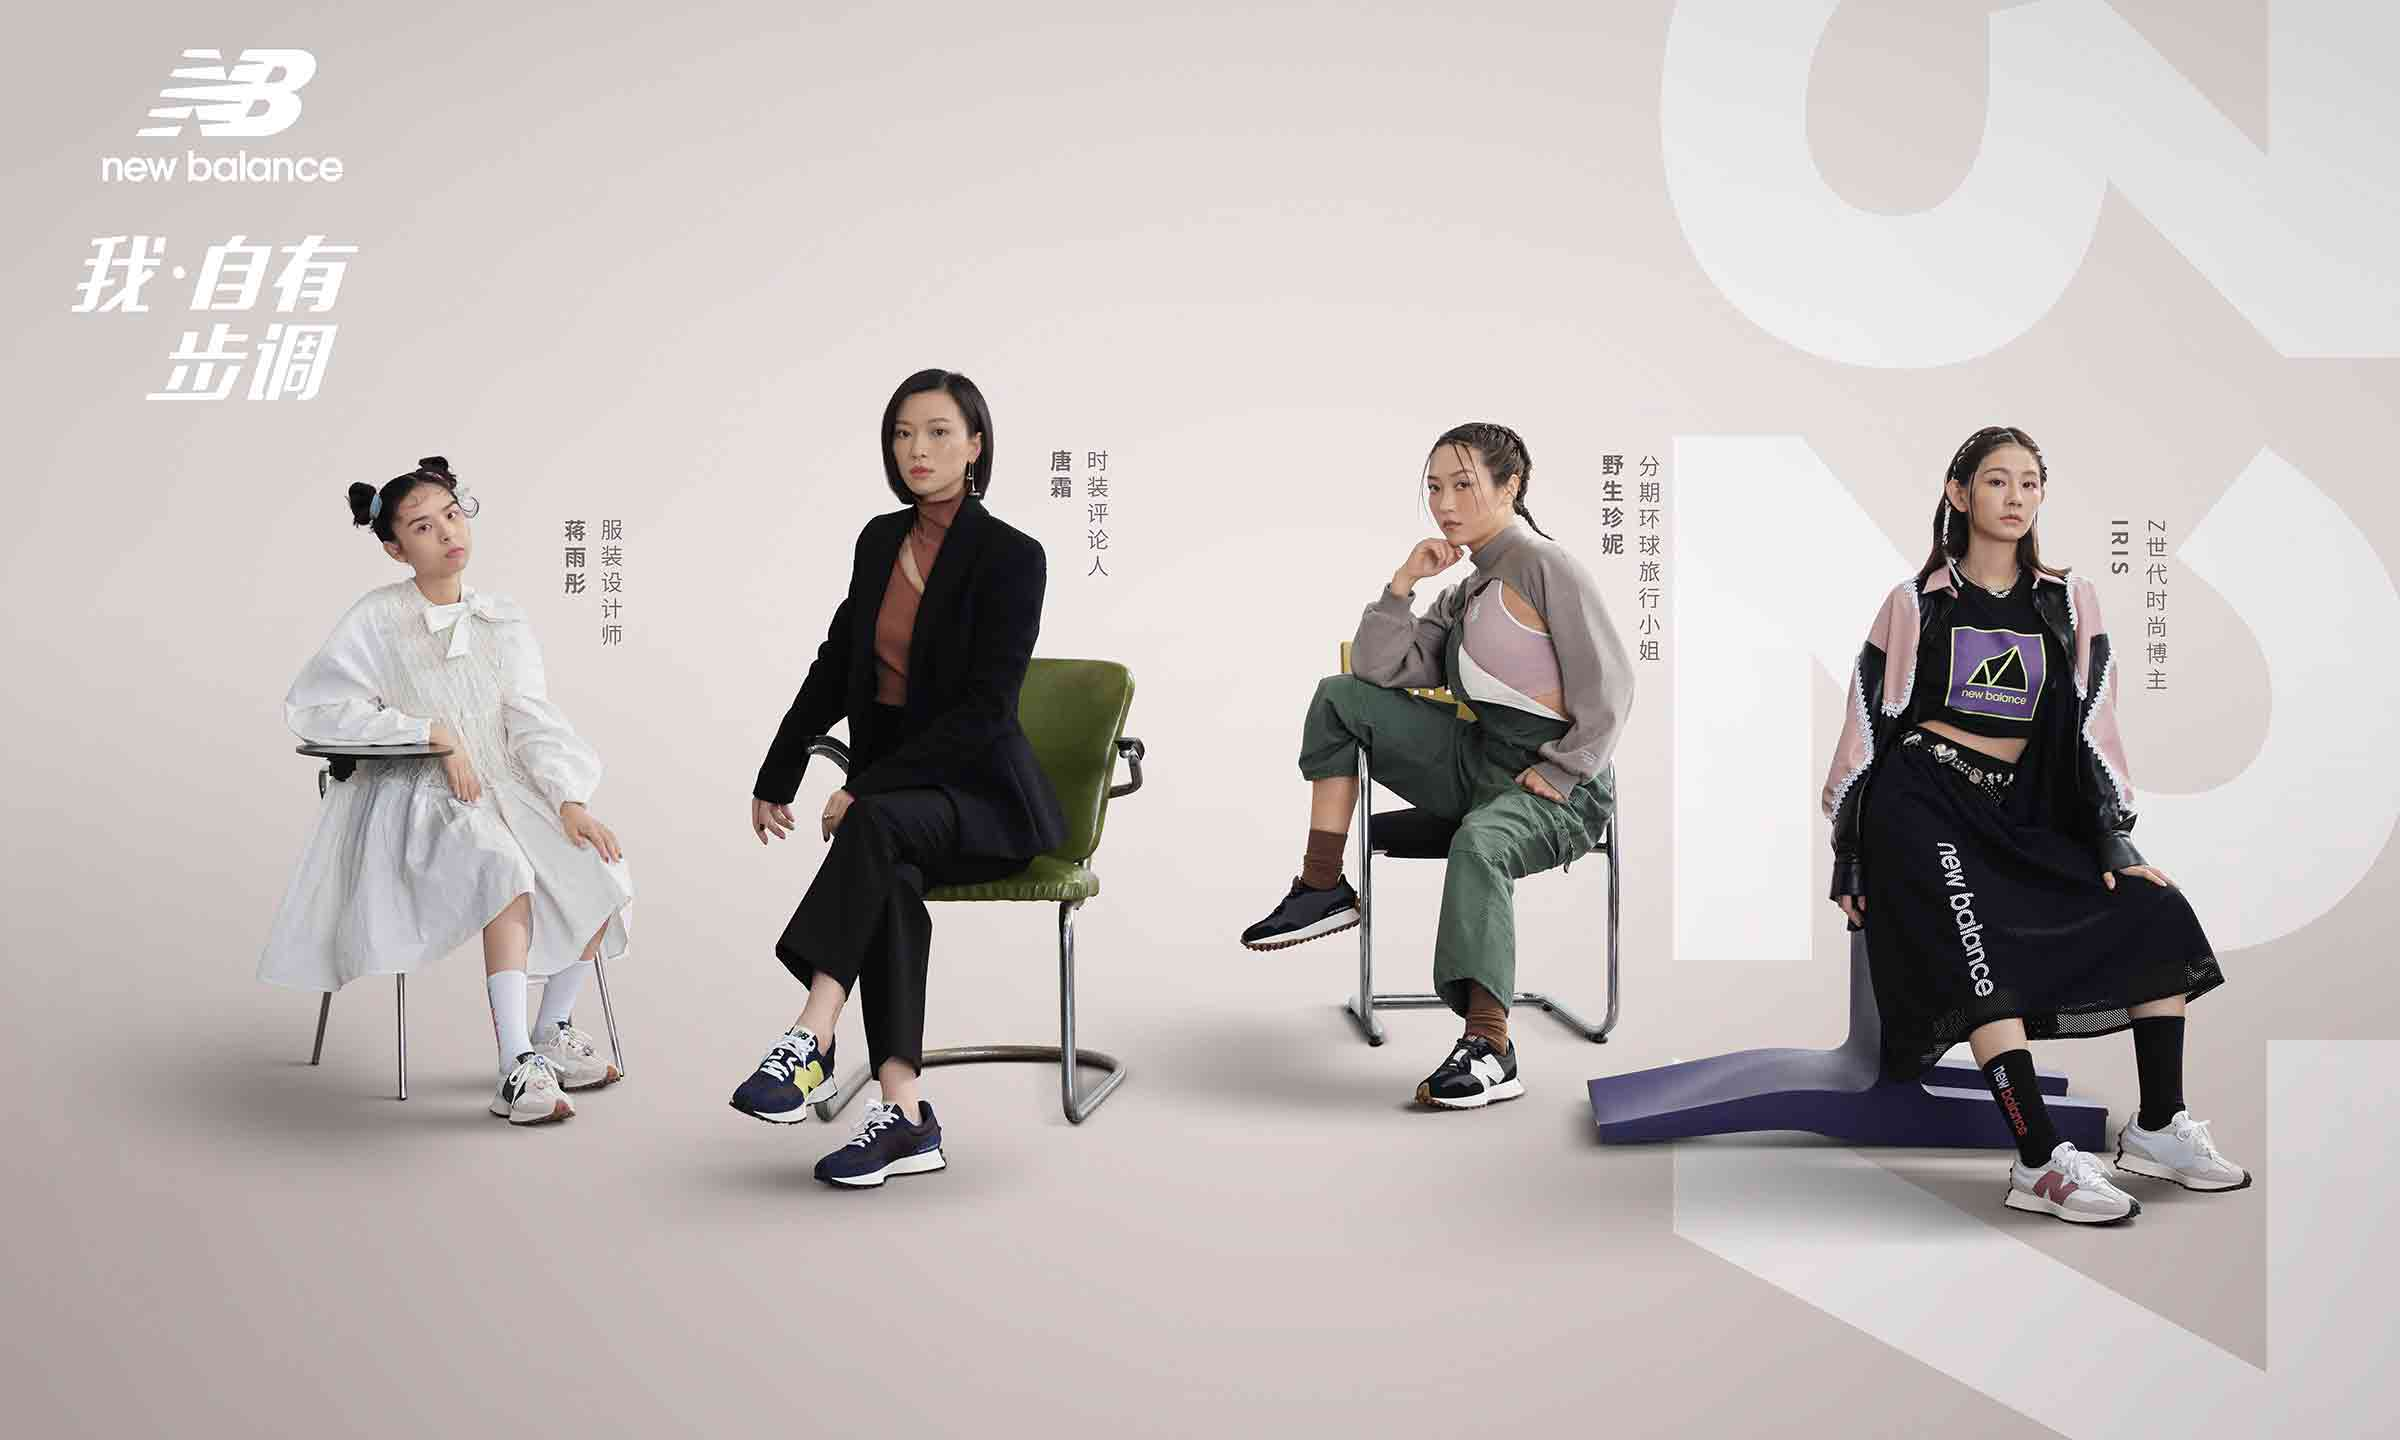 New Balance 327 鞋款再度发布全新热力配色